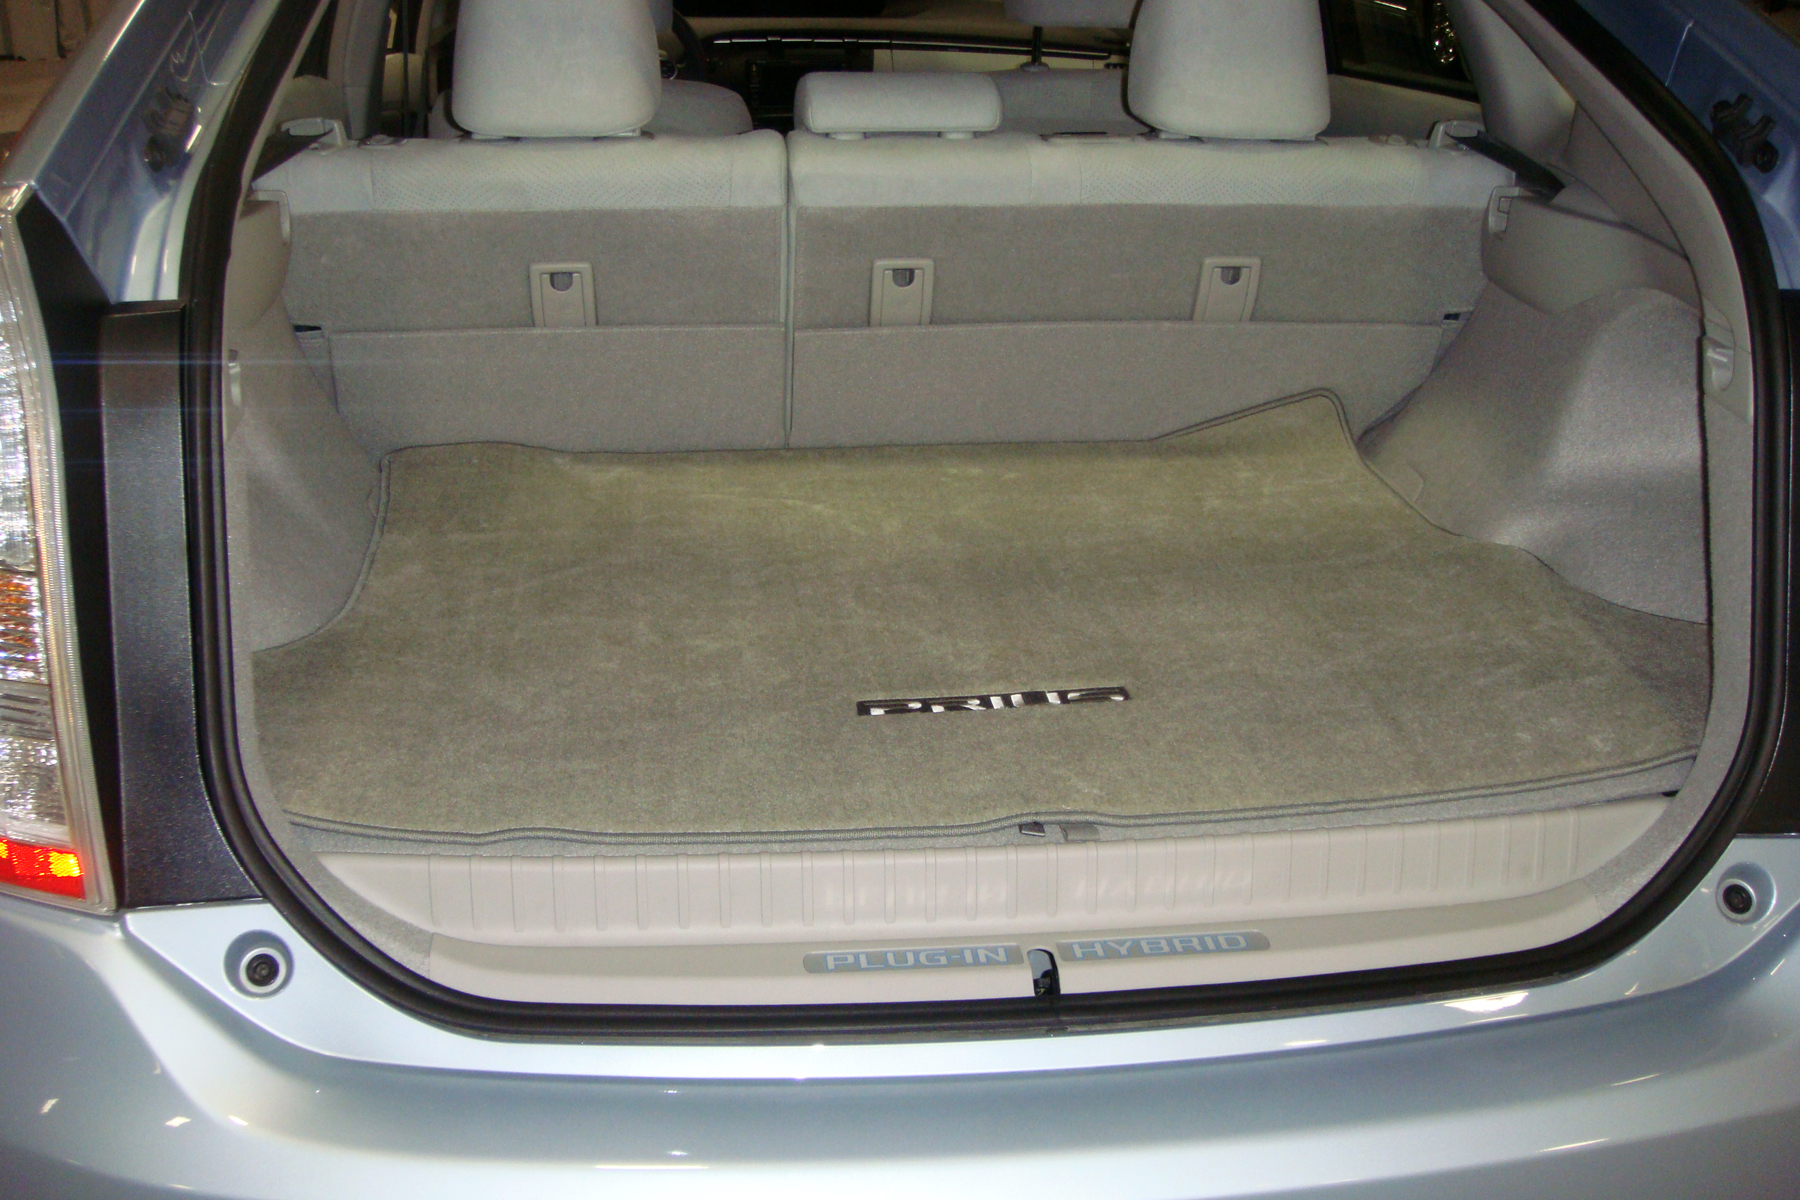 toyota prius v boot space. Black Bedroom Furniture Sets. Home Design Ideas